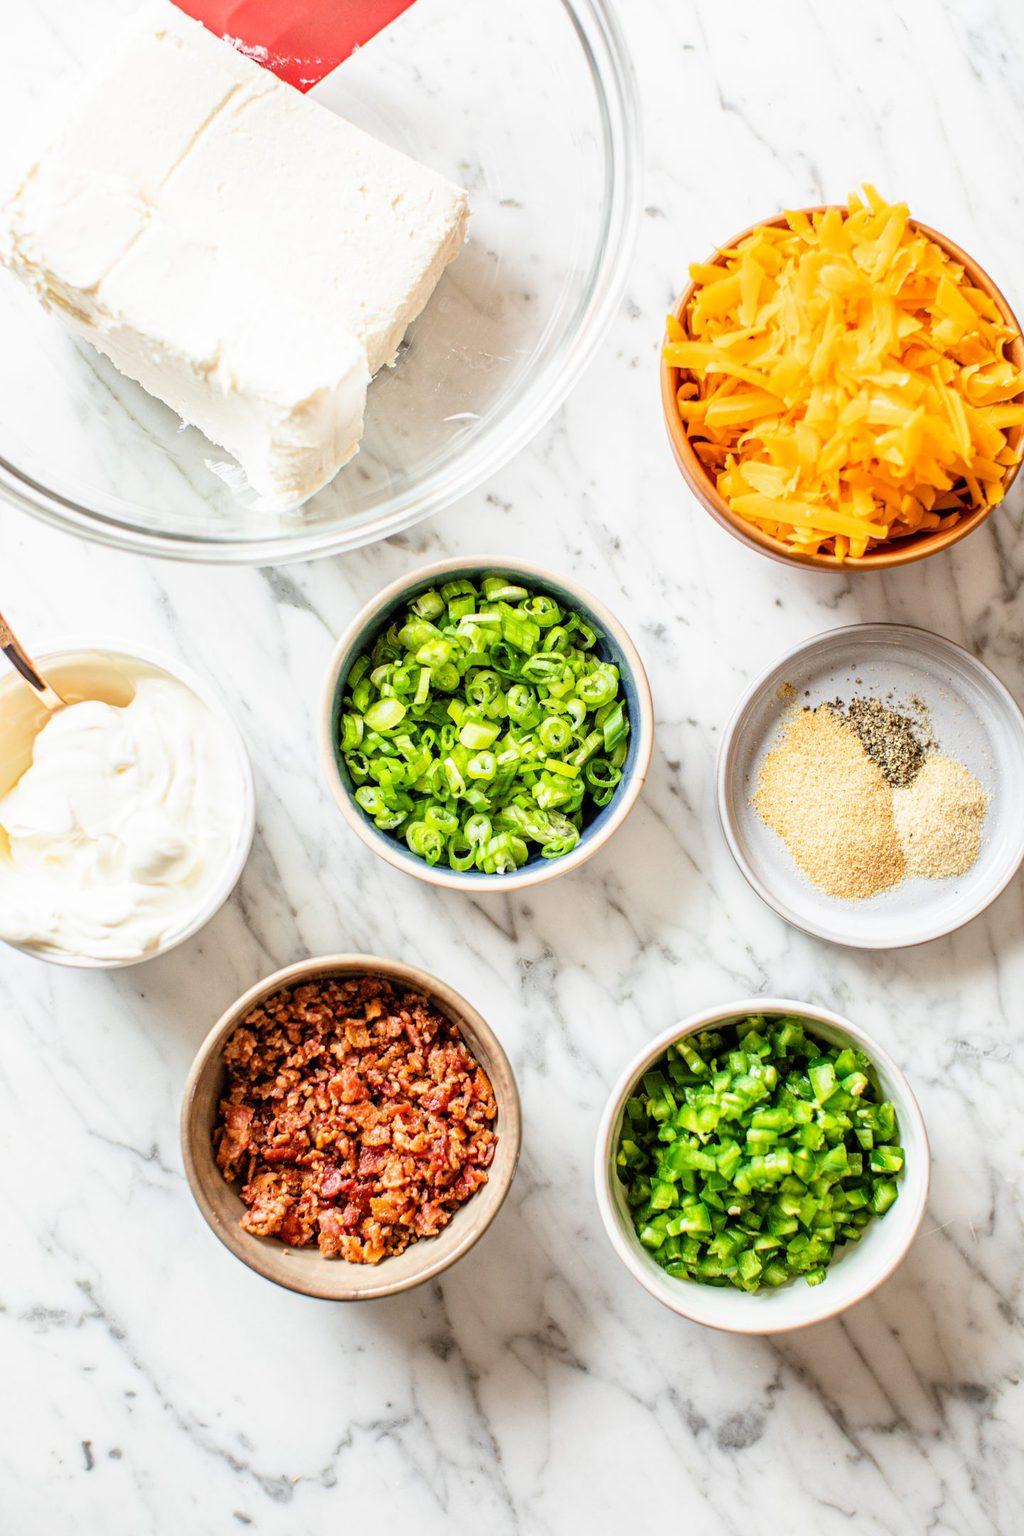 cream cheese, shredded cheddar, sour cream, scallions, seasonings, bacon, jalapenos